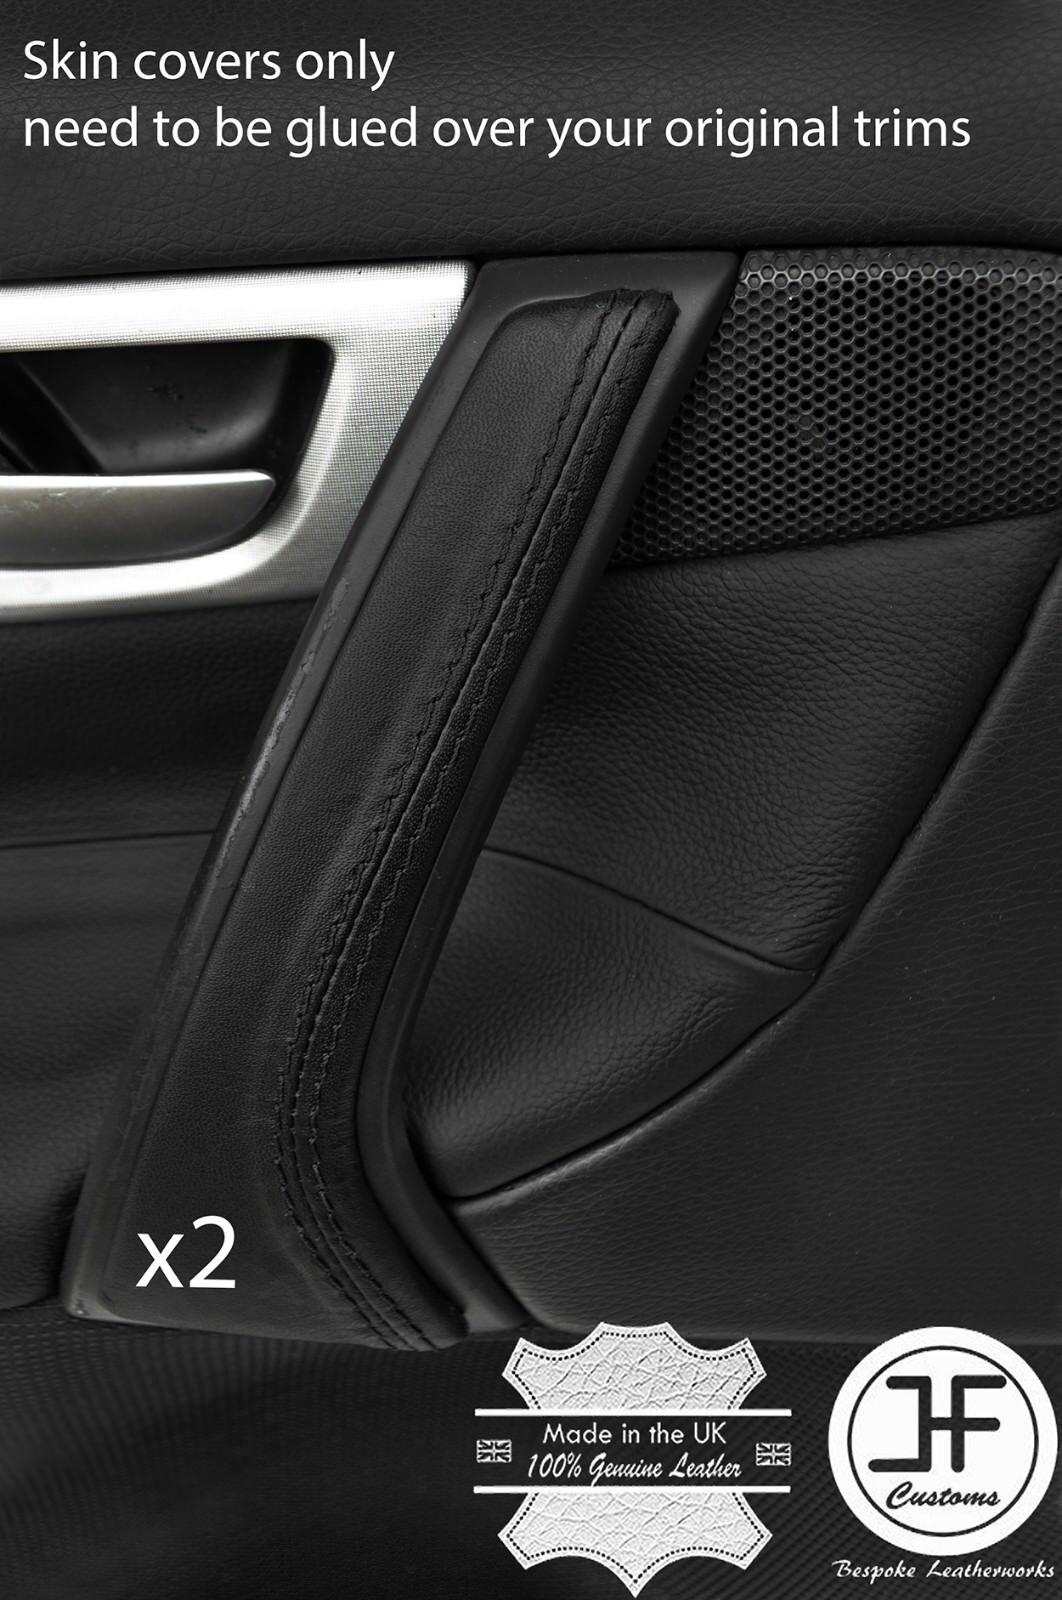 BLACK STITCH 2X REAR DOOR HANDLE TRIM LEATHER COVERS FITS BMW F30 2012-2016